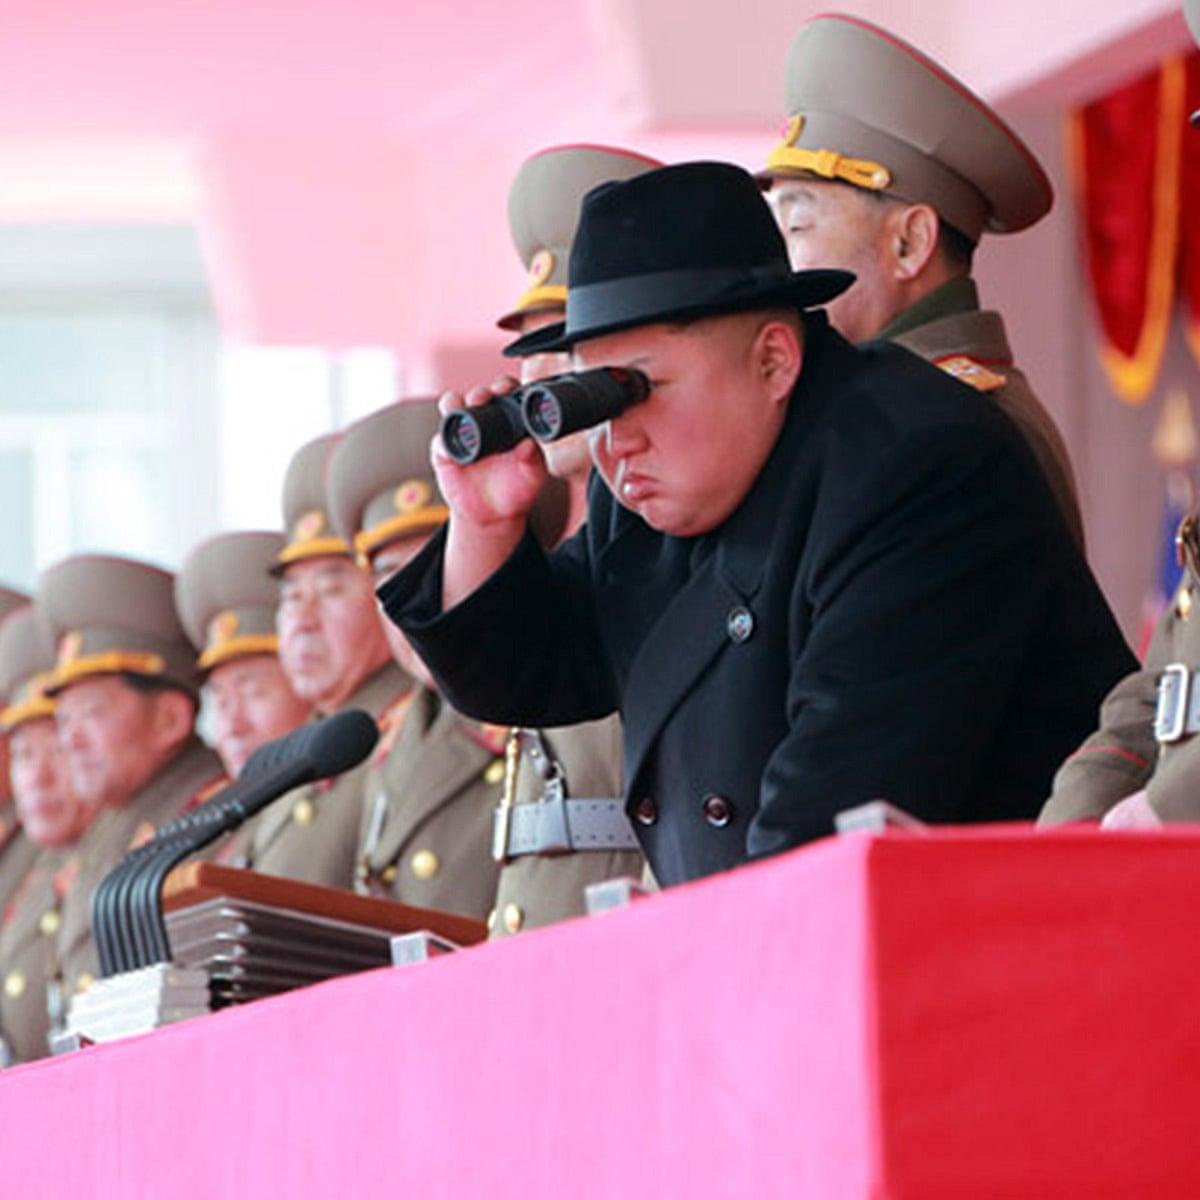 तानाशाह किम जोंग